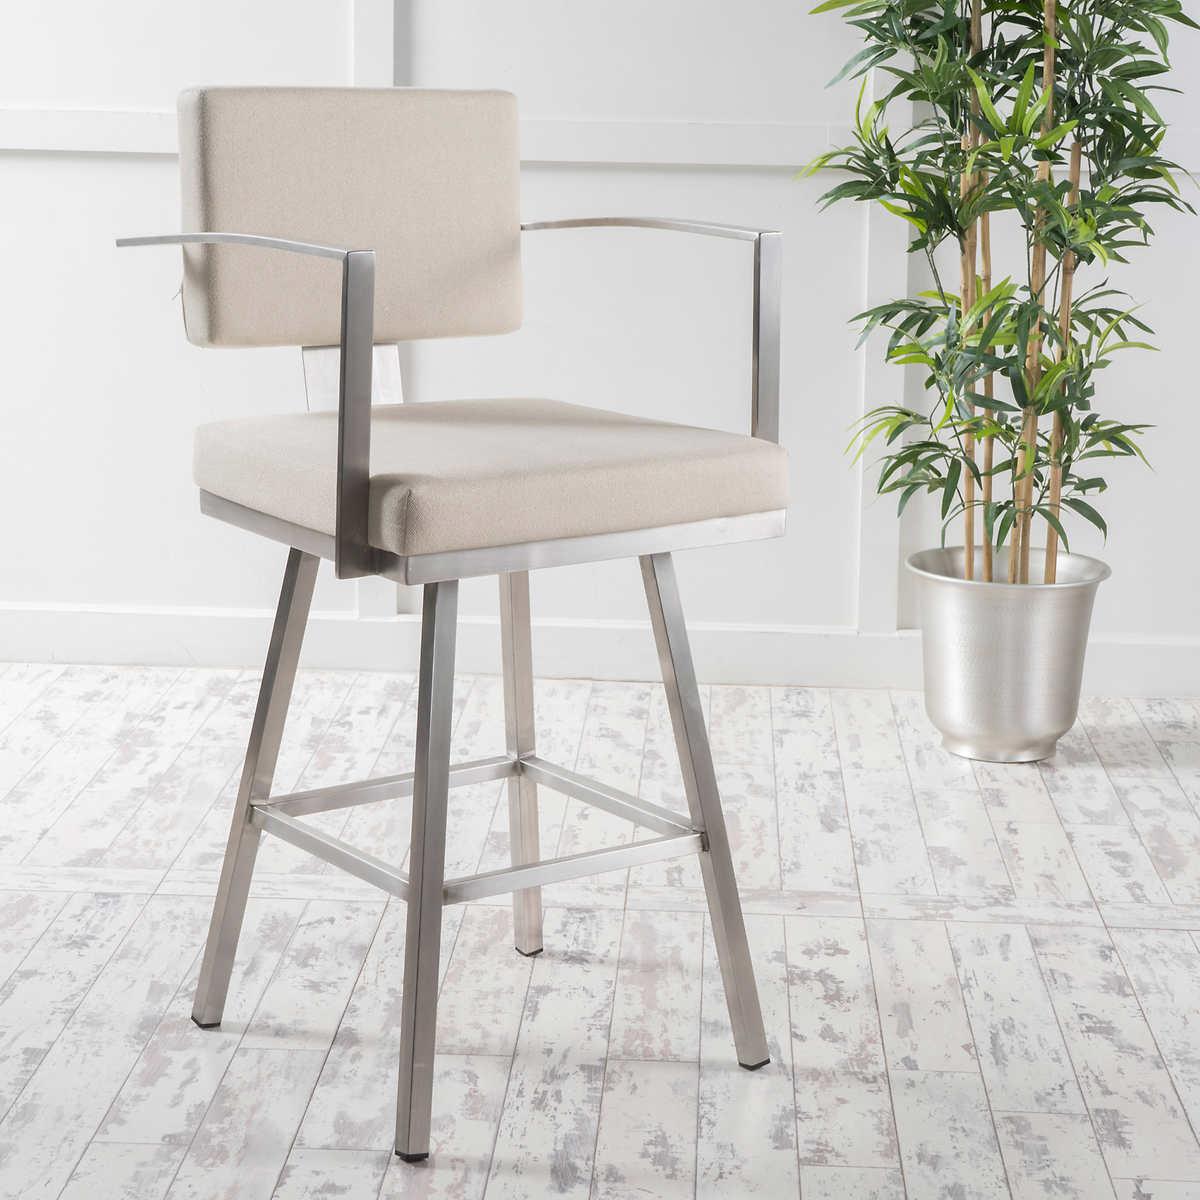 Furniture Warehouse Kitchener Barstools